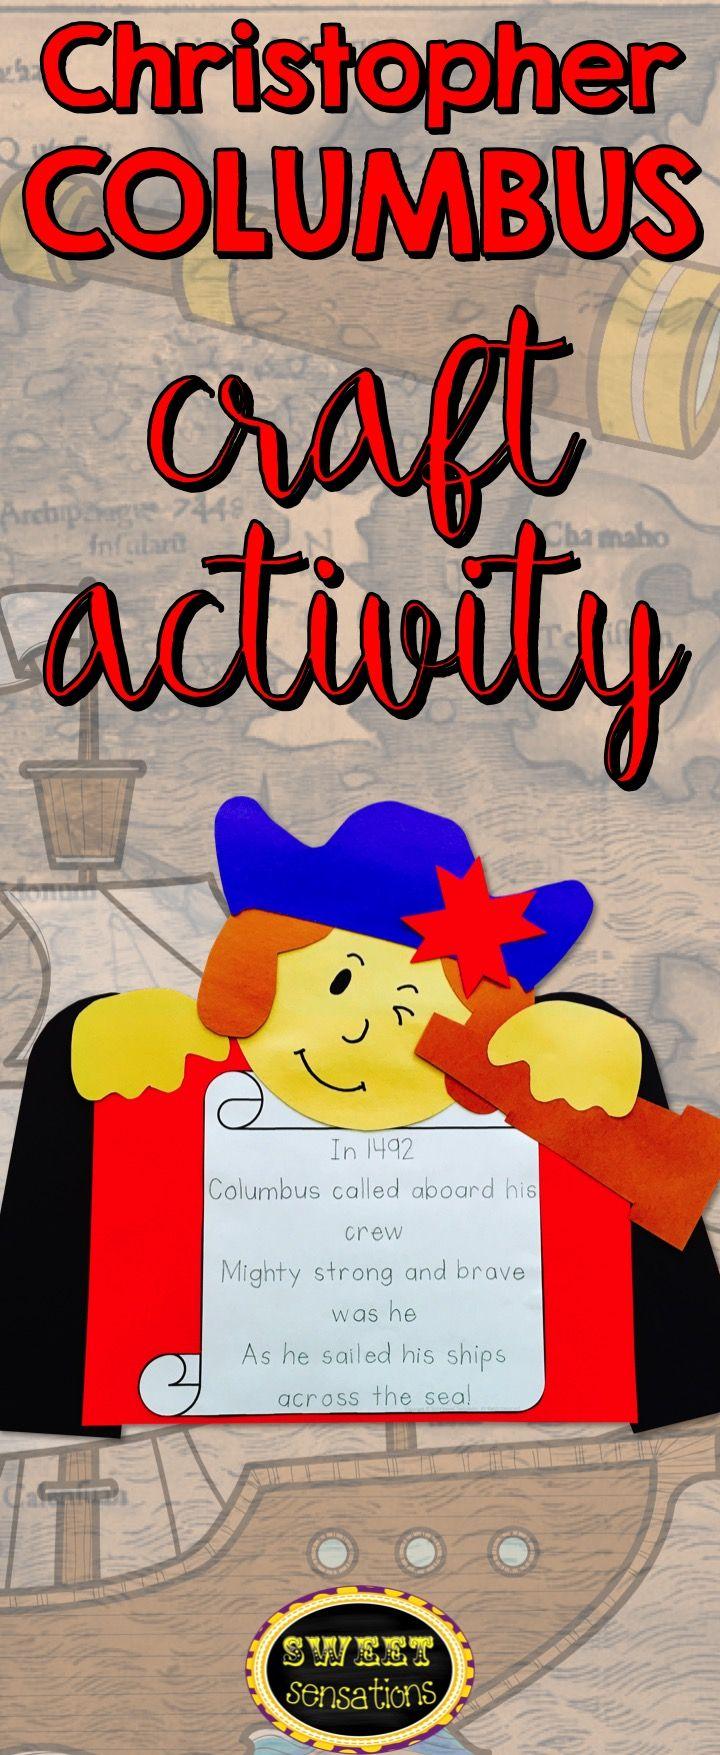 001 Christopher Columbus Craft Activity Mandy Bledsoe's